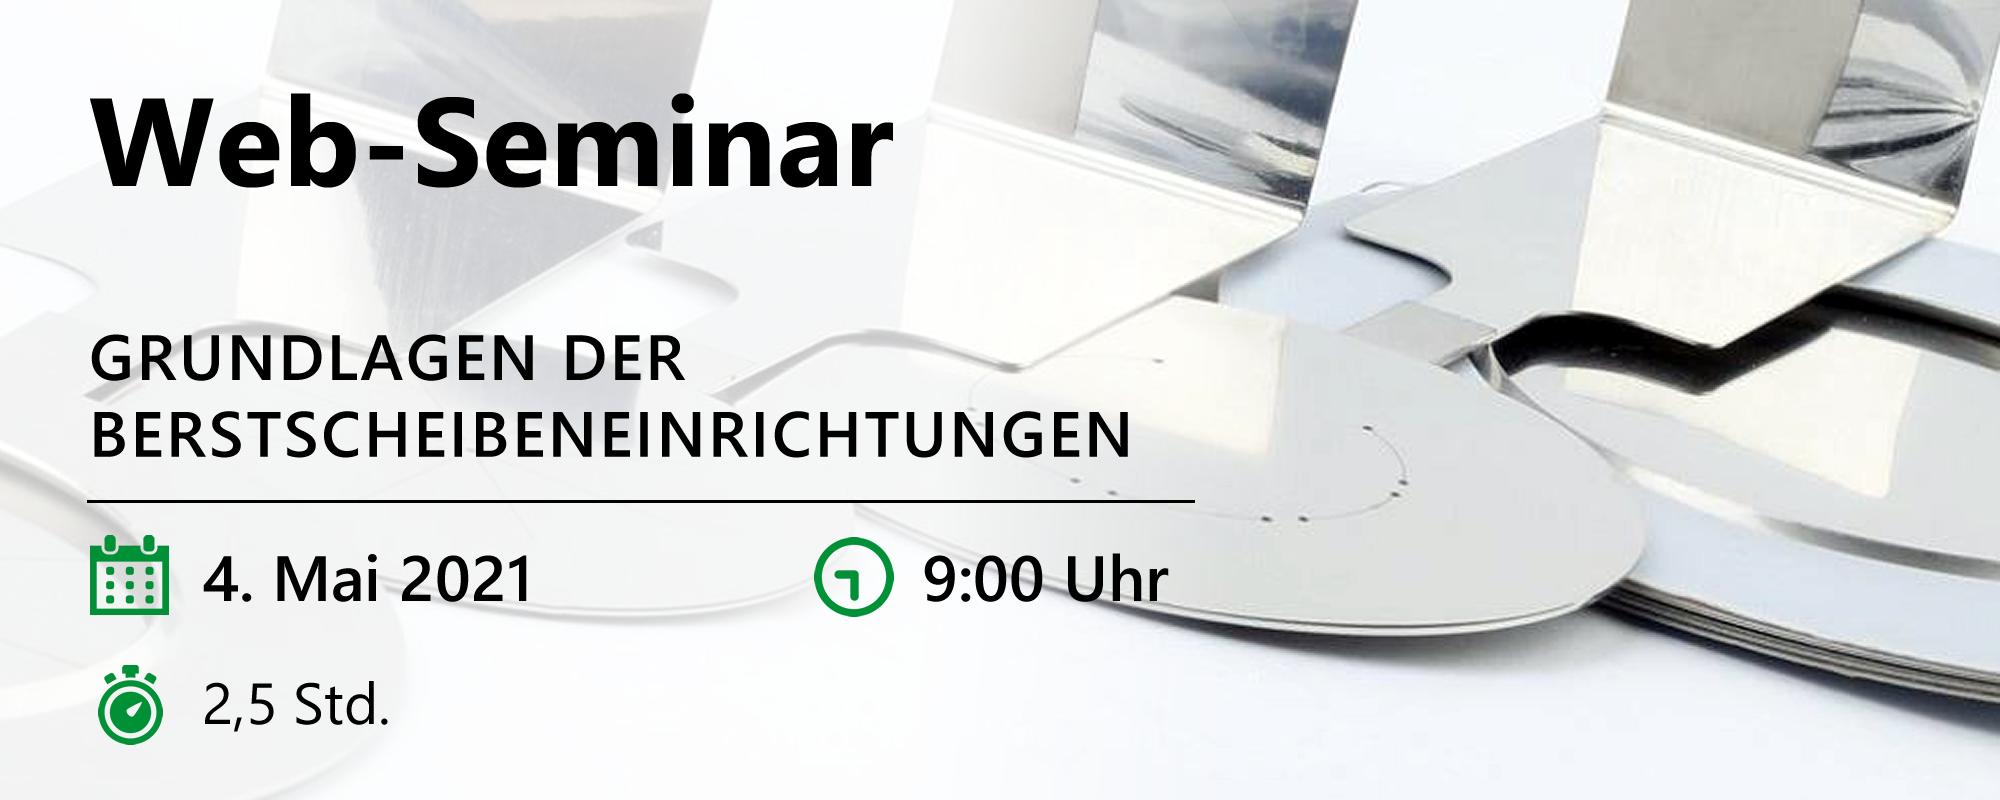 Web-Seminar am 04.05.2021